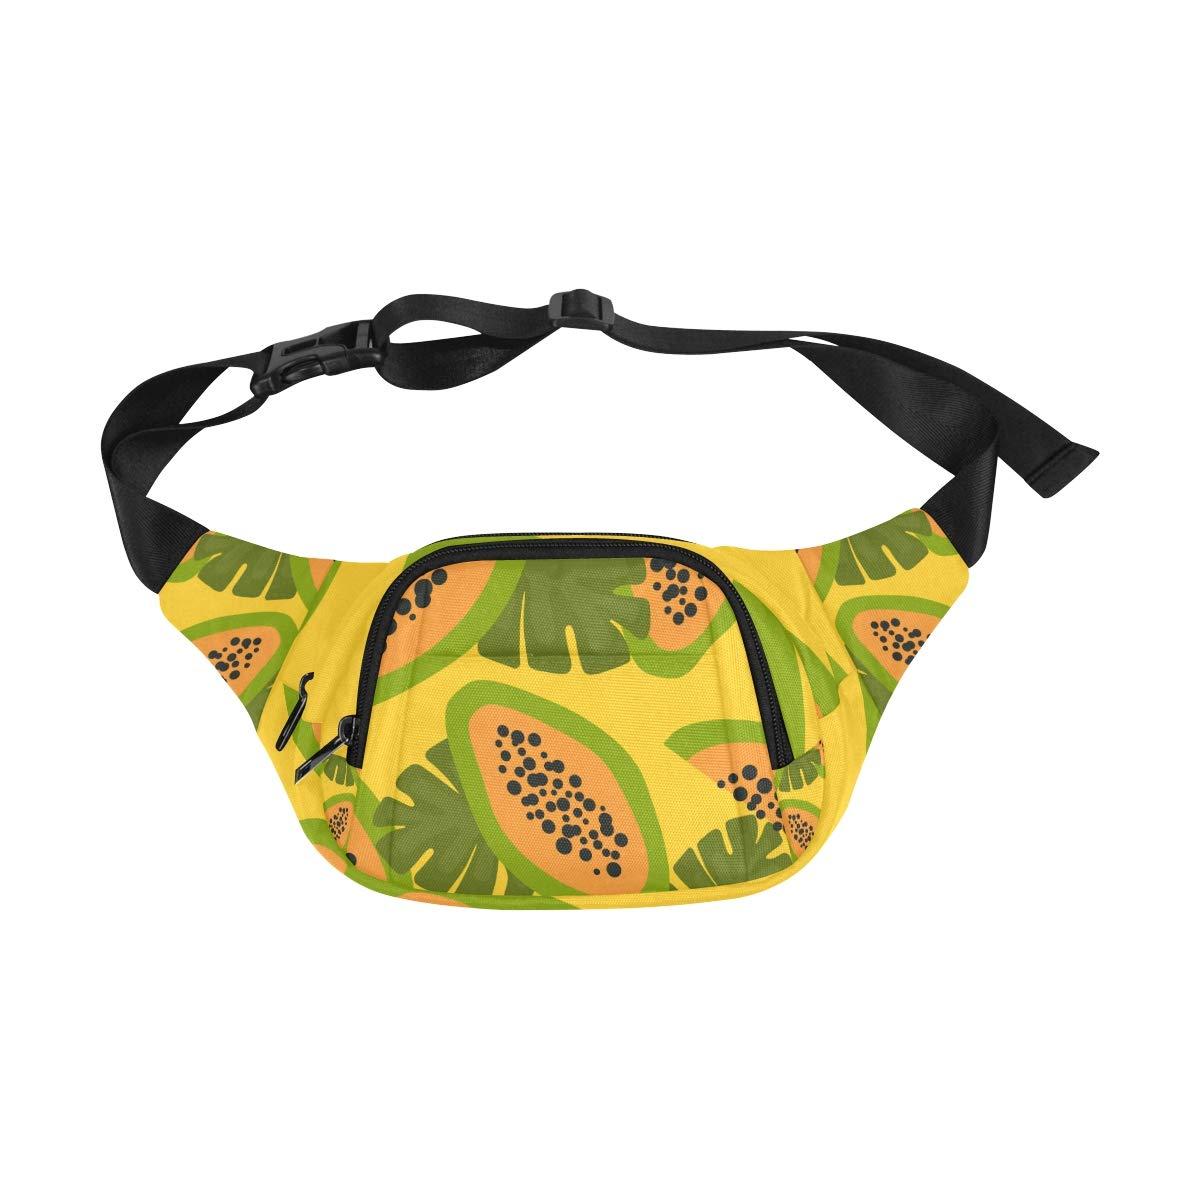 Tropical Plant Sketch Style Fenny Packs Waist Bags Adjustable Belt Waterproof Nylon Travel Running Sport Vacation Party For Men Women Boys Girls Kids